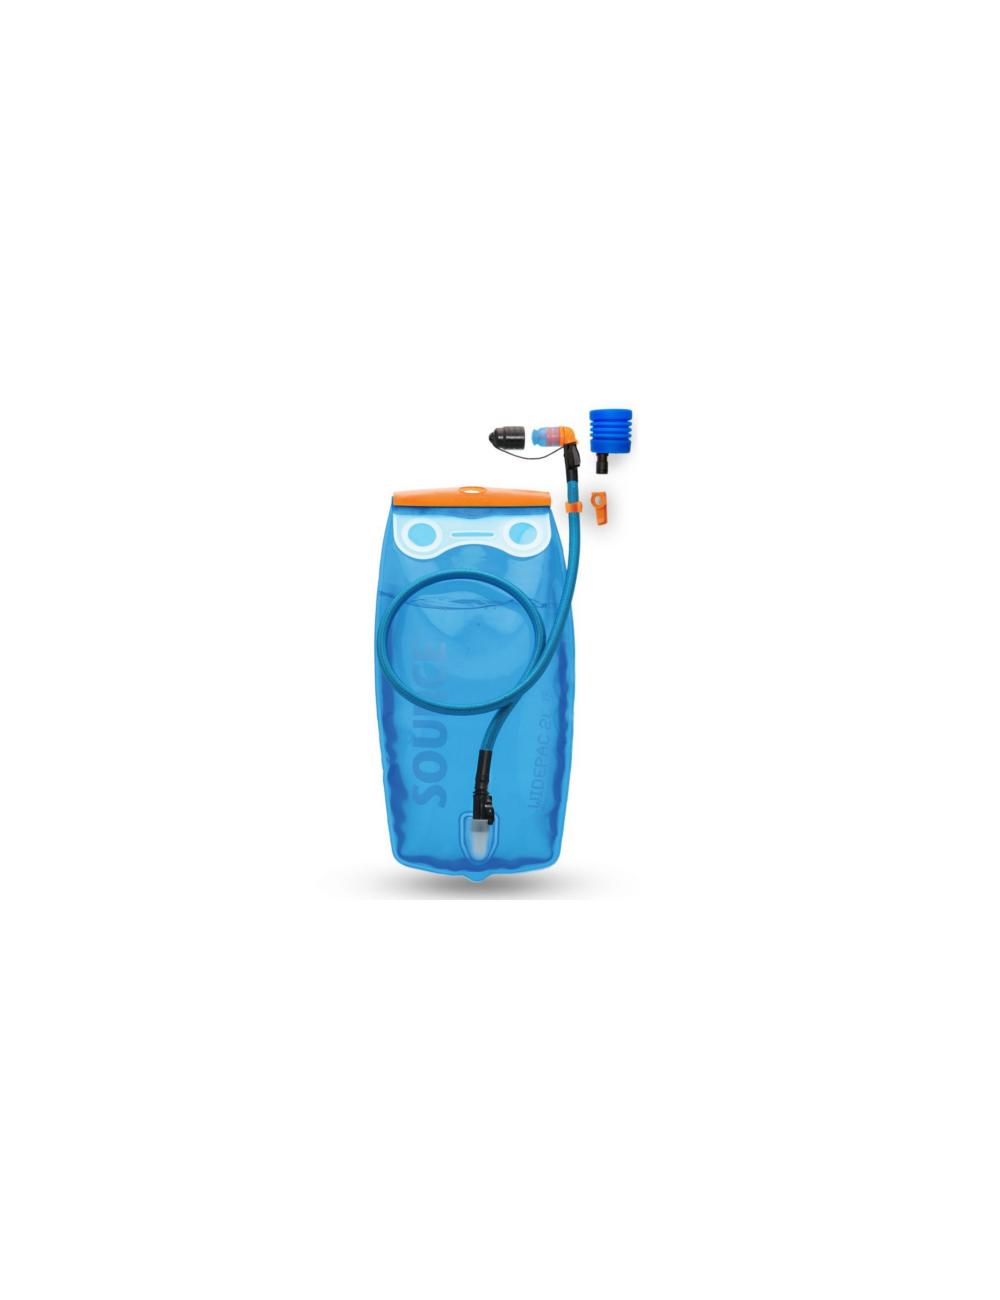 Source drinksysteem Ultimate Hydration System met snelvuladapter - 2L